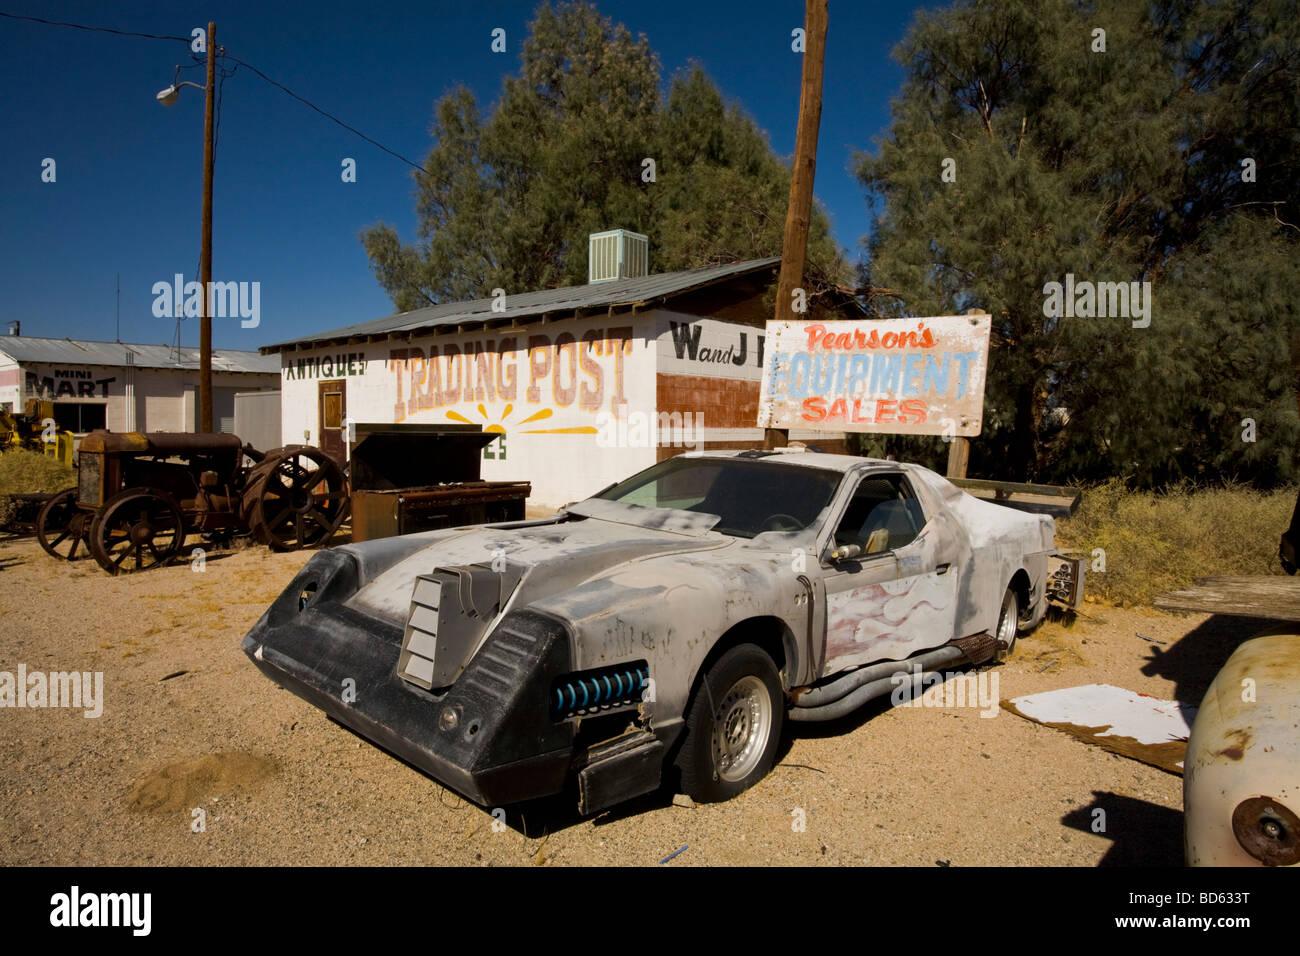 Odd Car at a junk yard in Pearsonville Route 395 Eastern Sierra ...